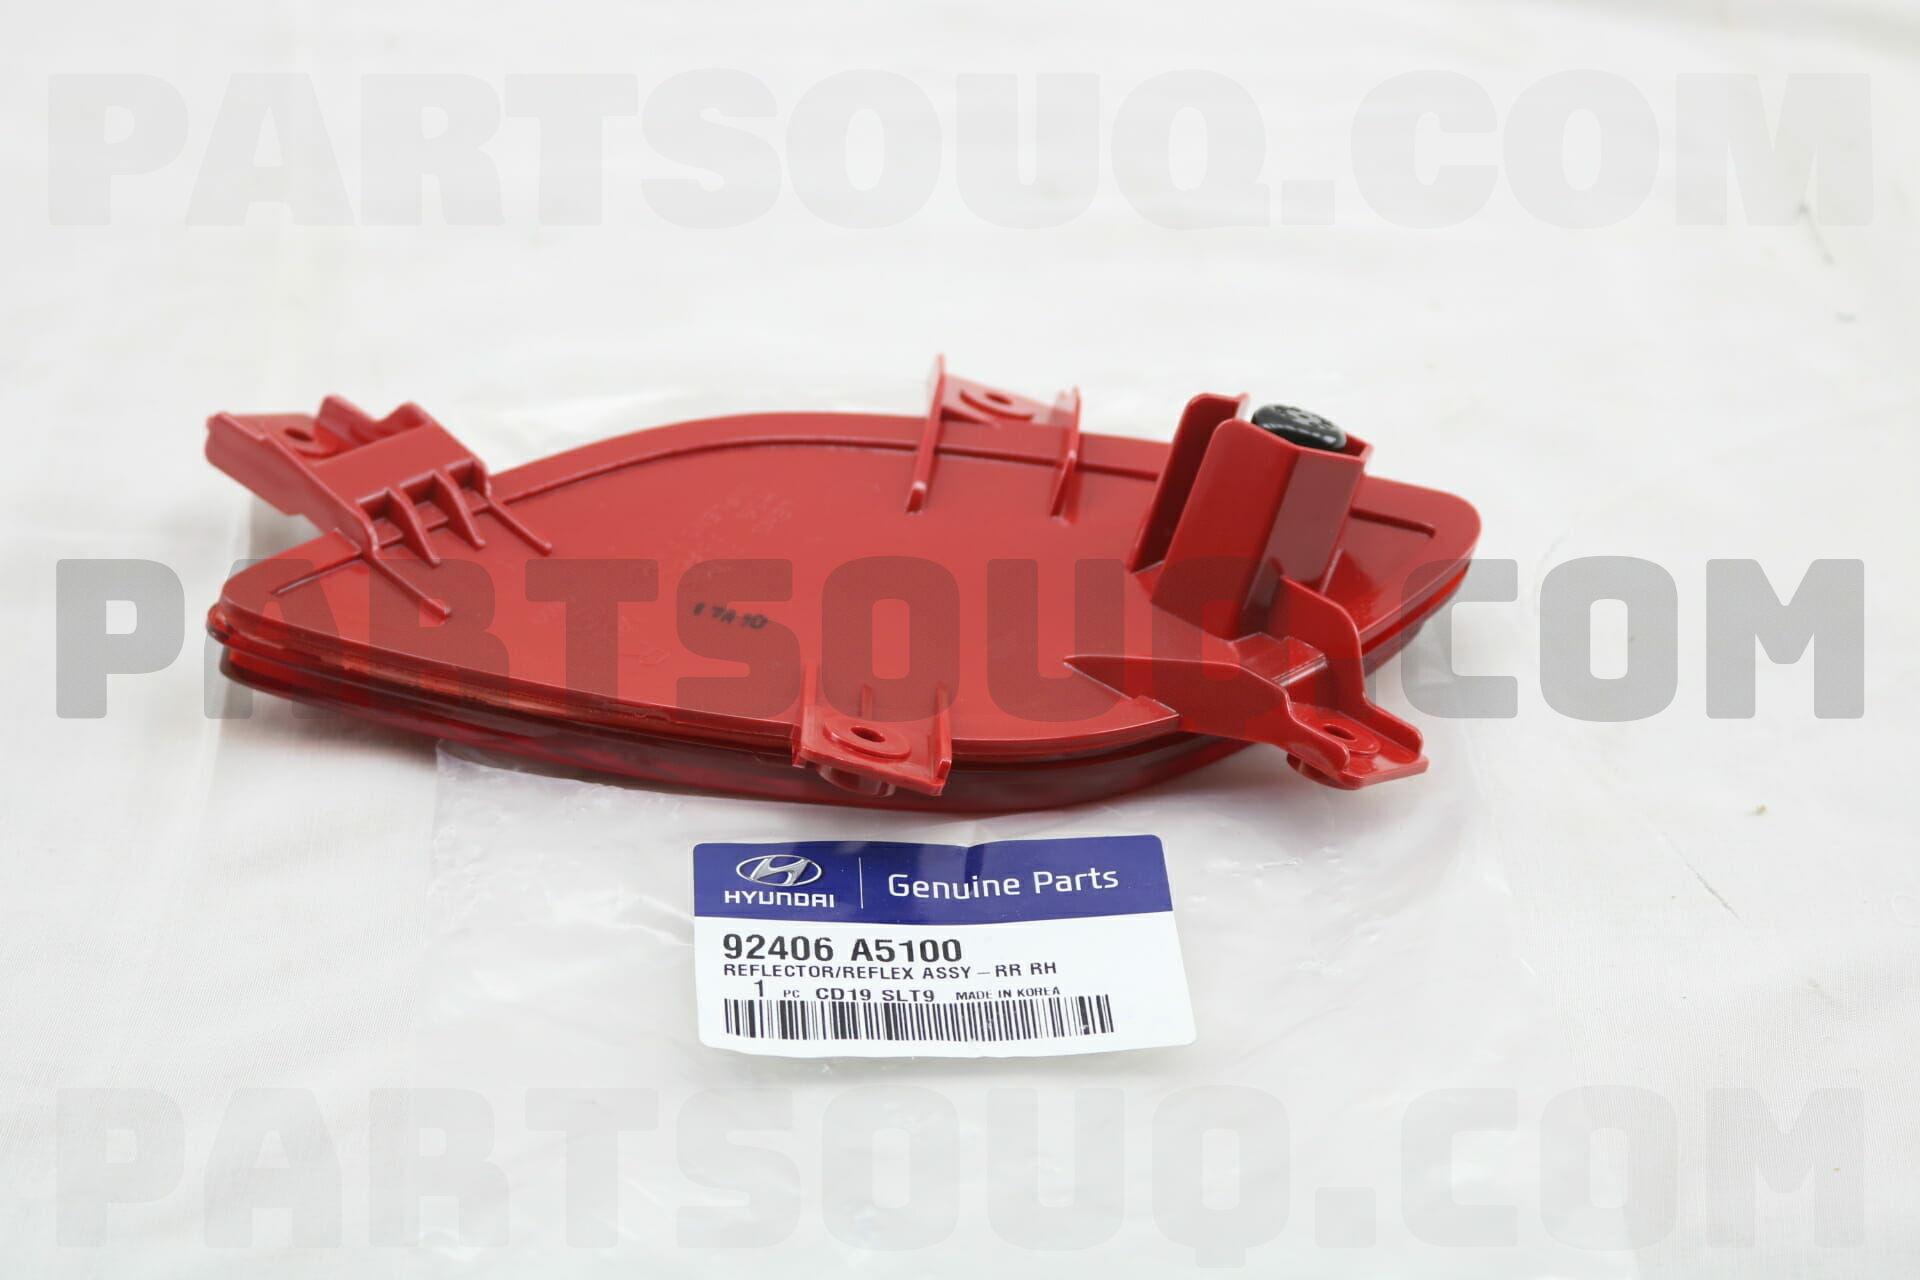 92406A5100 Hyundai / KIA REFLECTOR/REFLEX ASSY-RR RH Price: 24 18